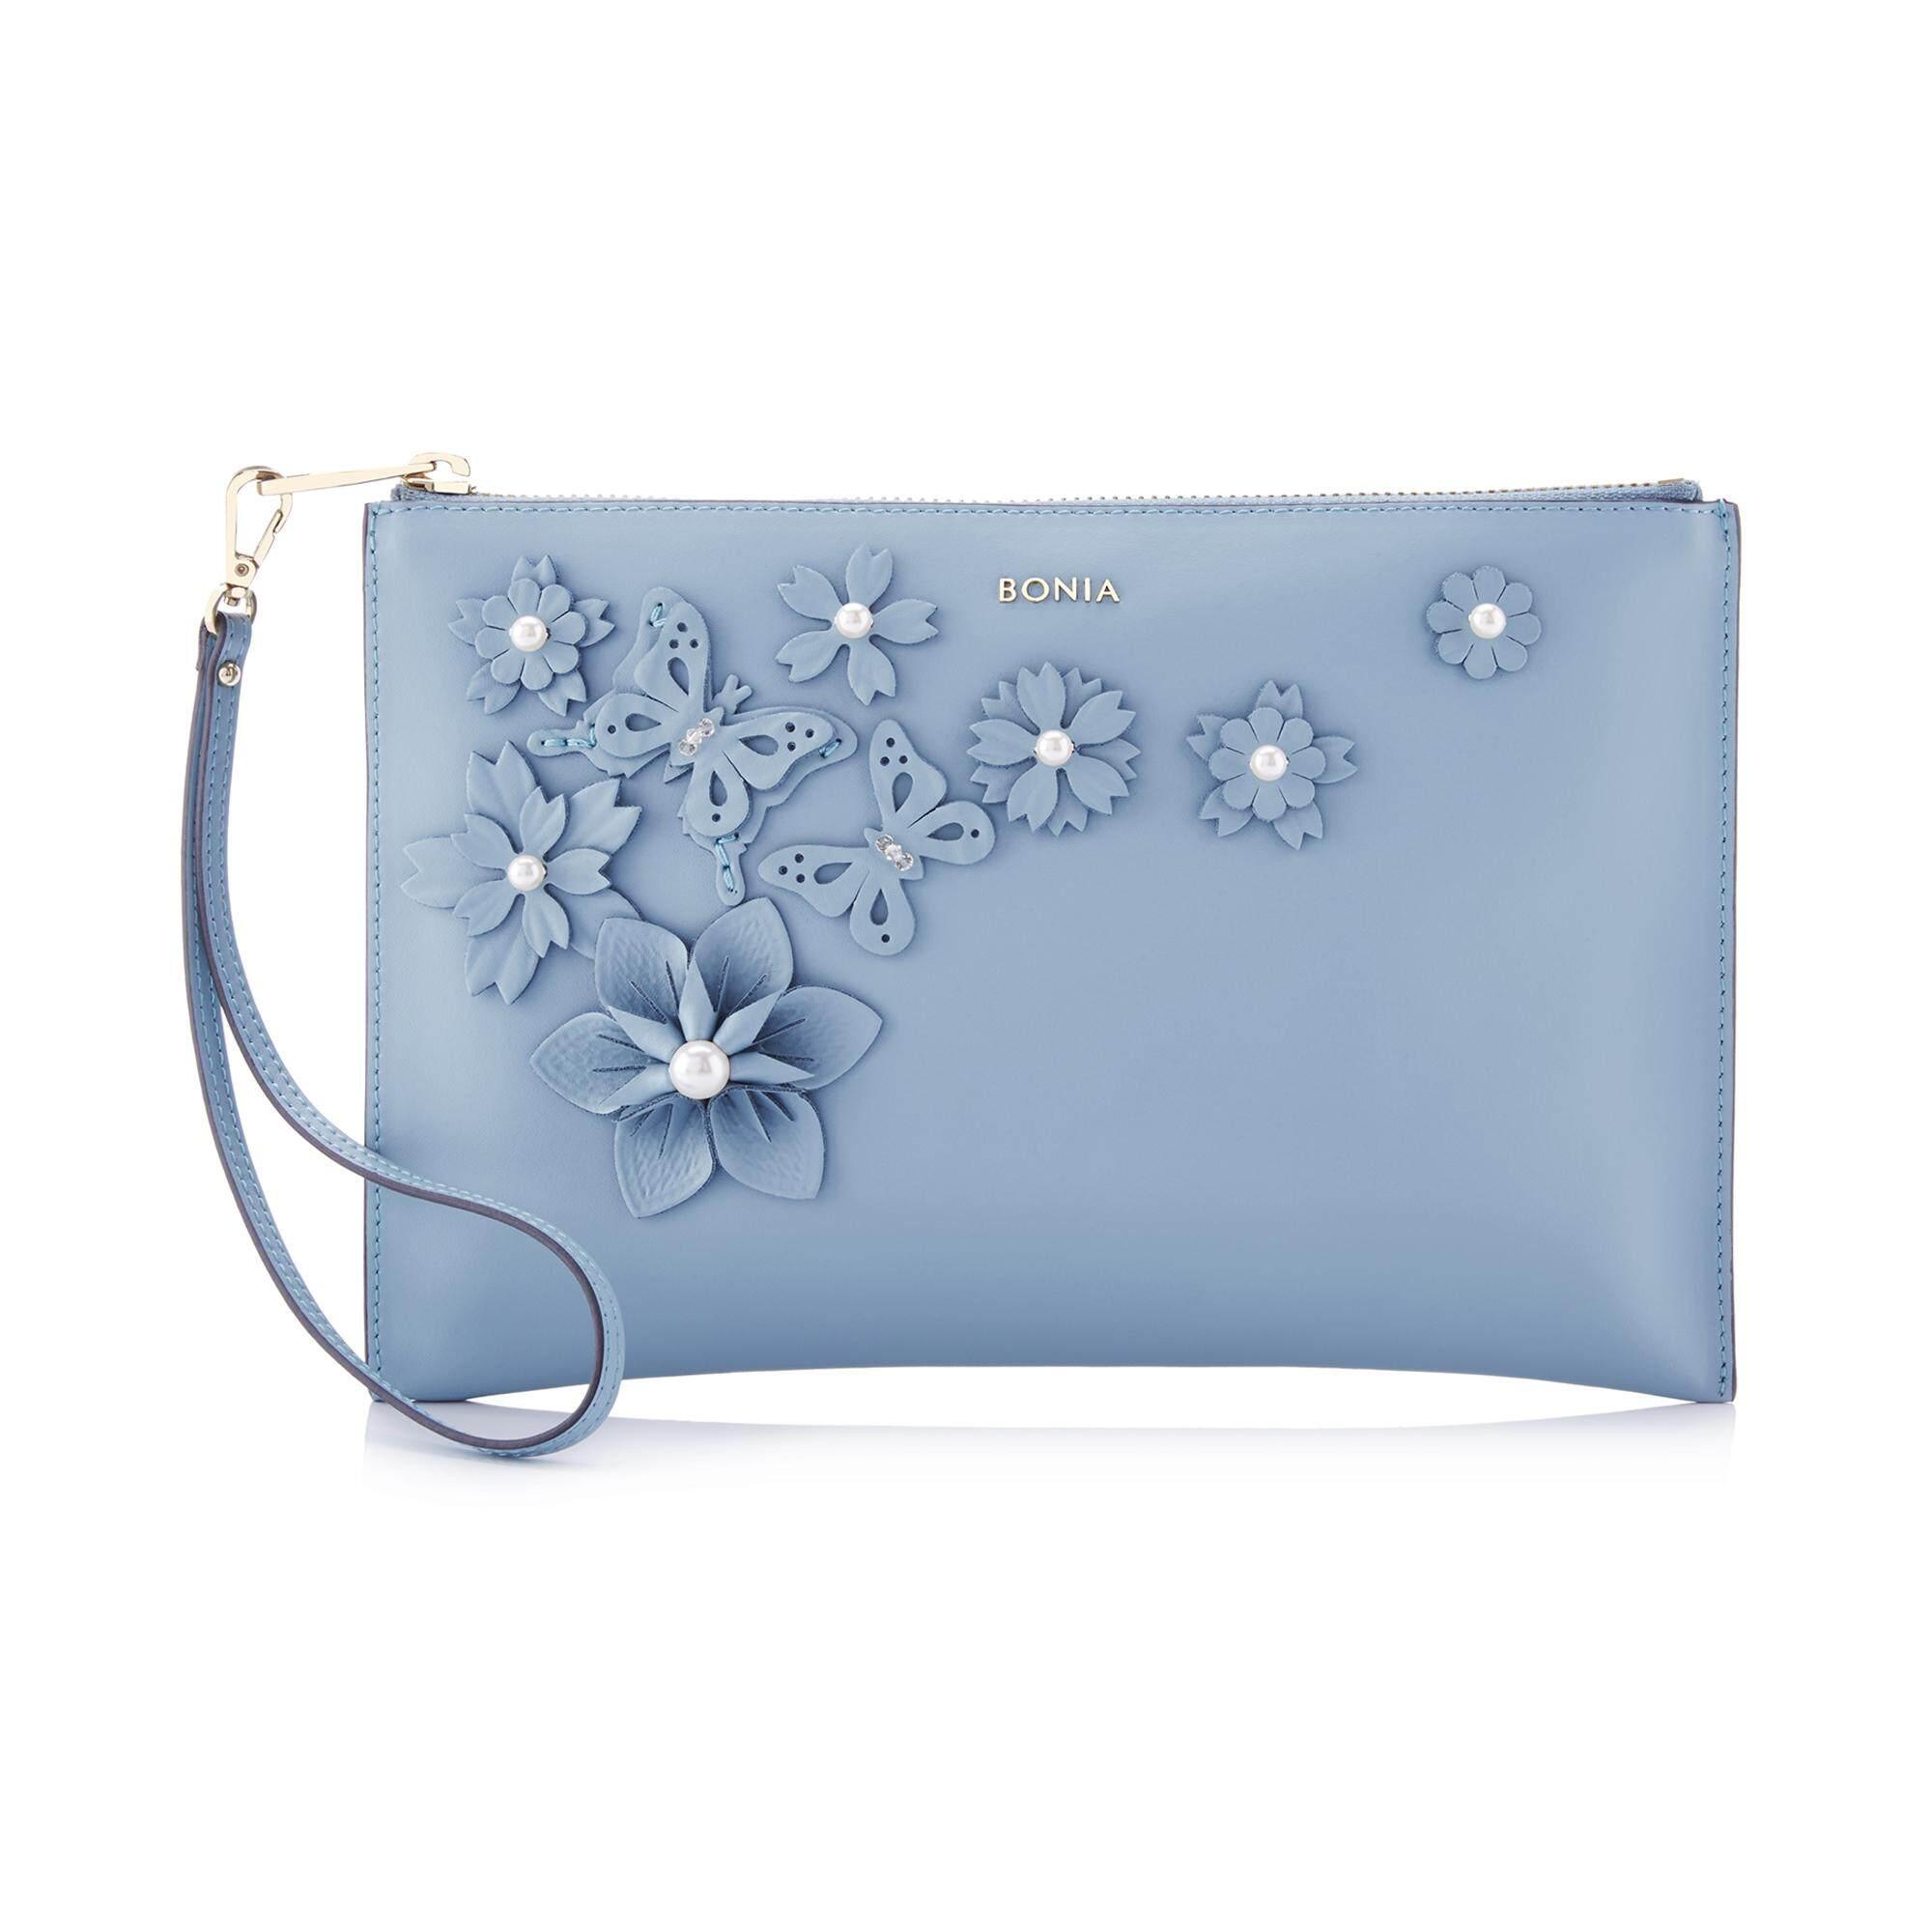 ae40ad7d83b9 Bonia Women Bags price in Malaysia - Best Bonia Women Bags